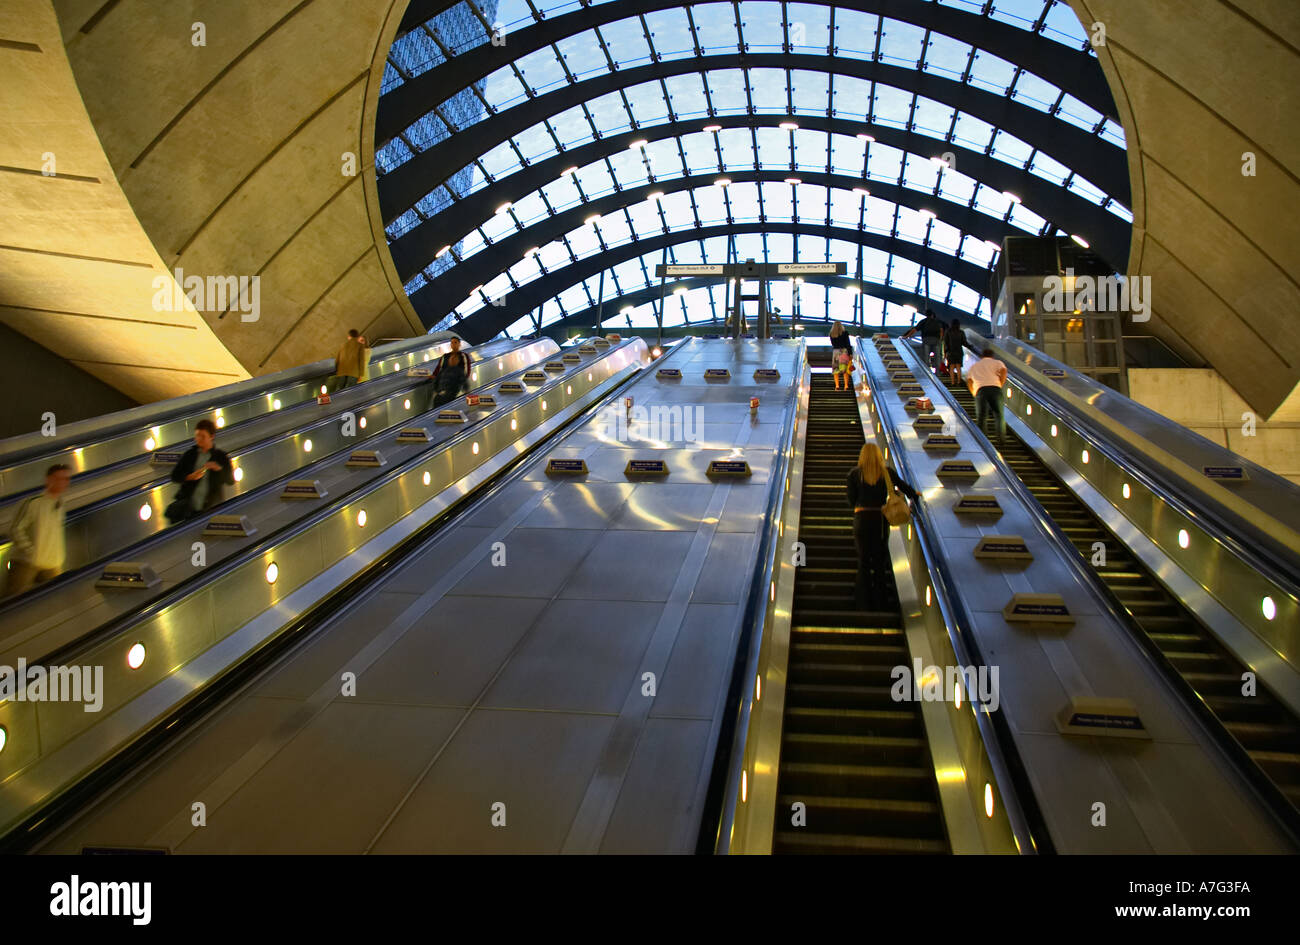 Canary Wharf tube underground station escalators in Docklands London England Britain UK - Stock Image